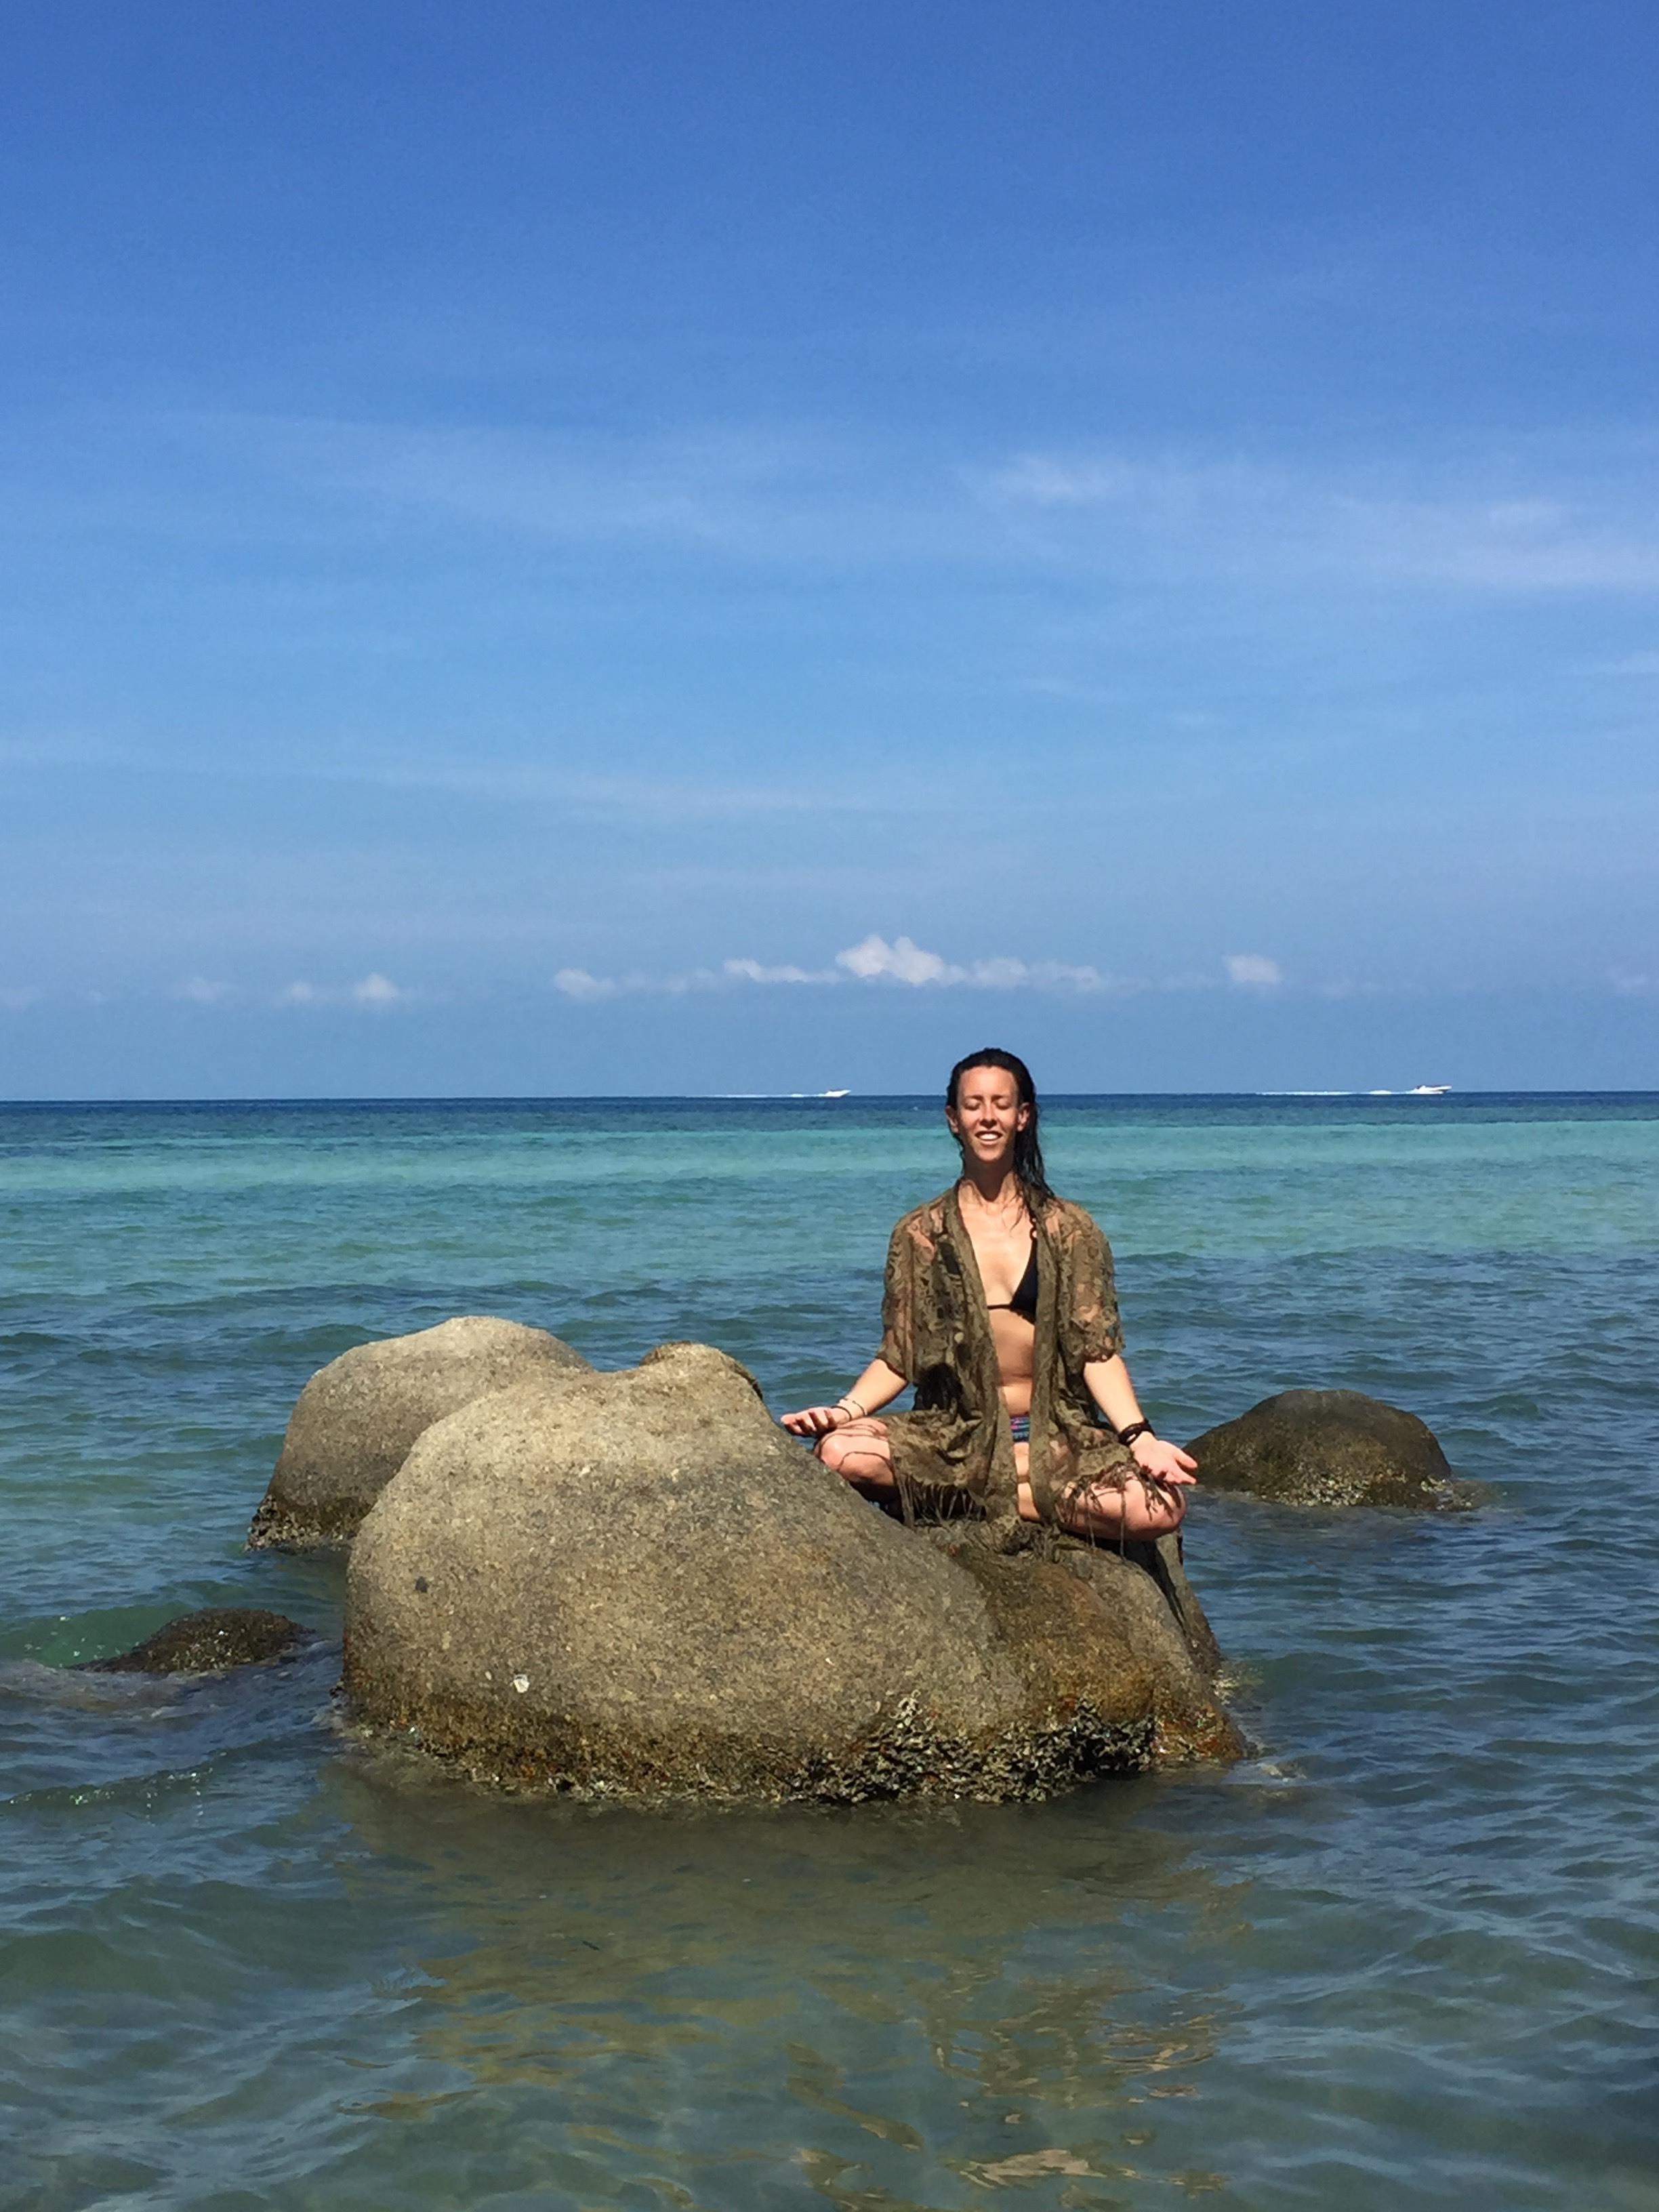 breathwork facilitator and yoga instructor